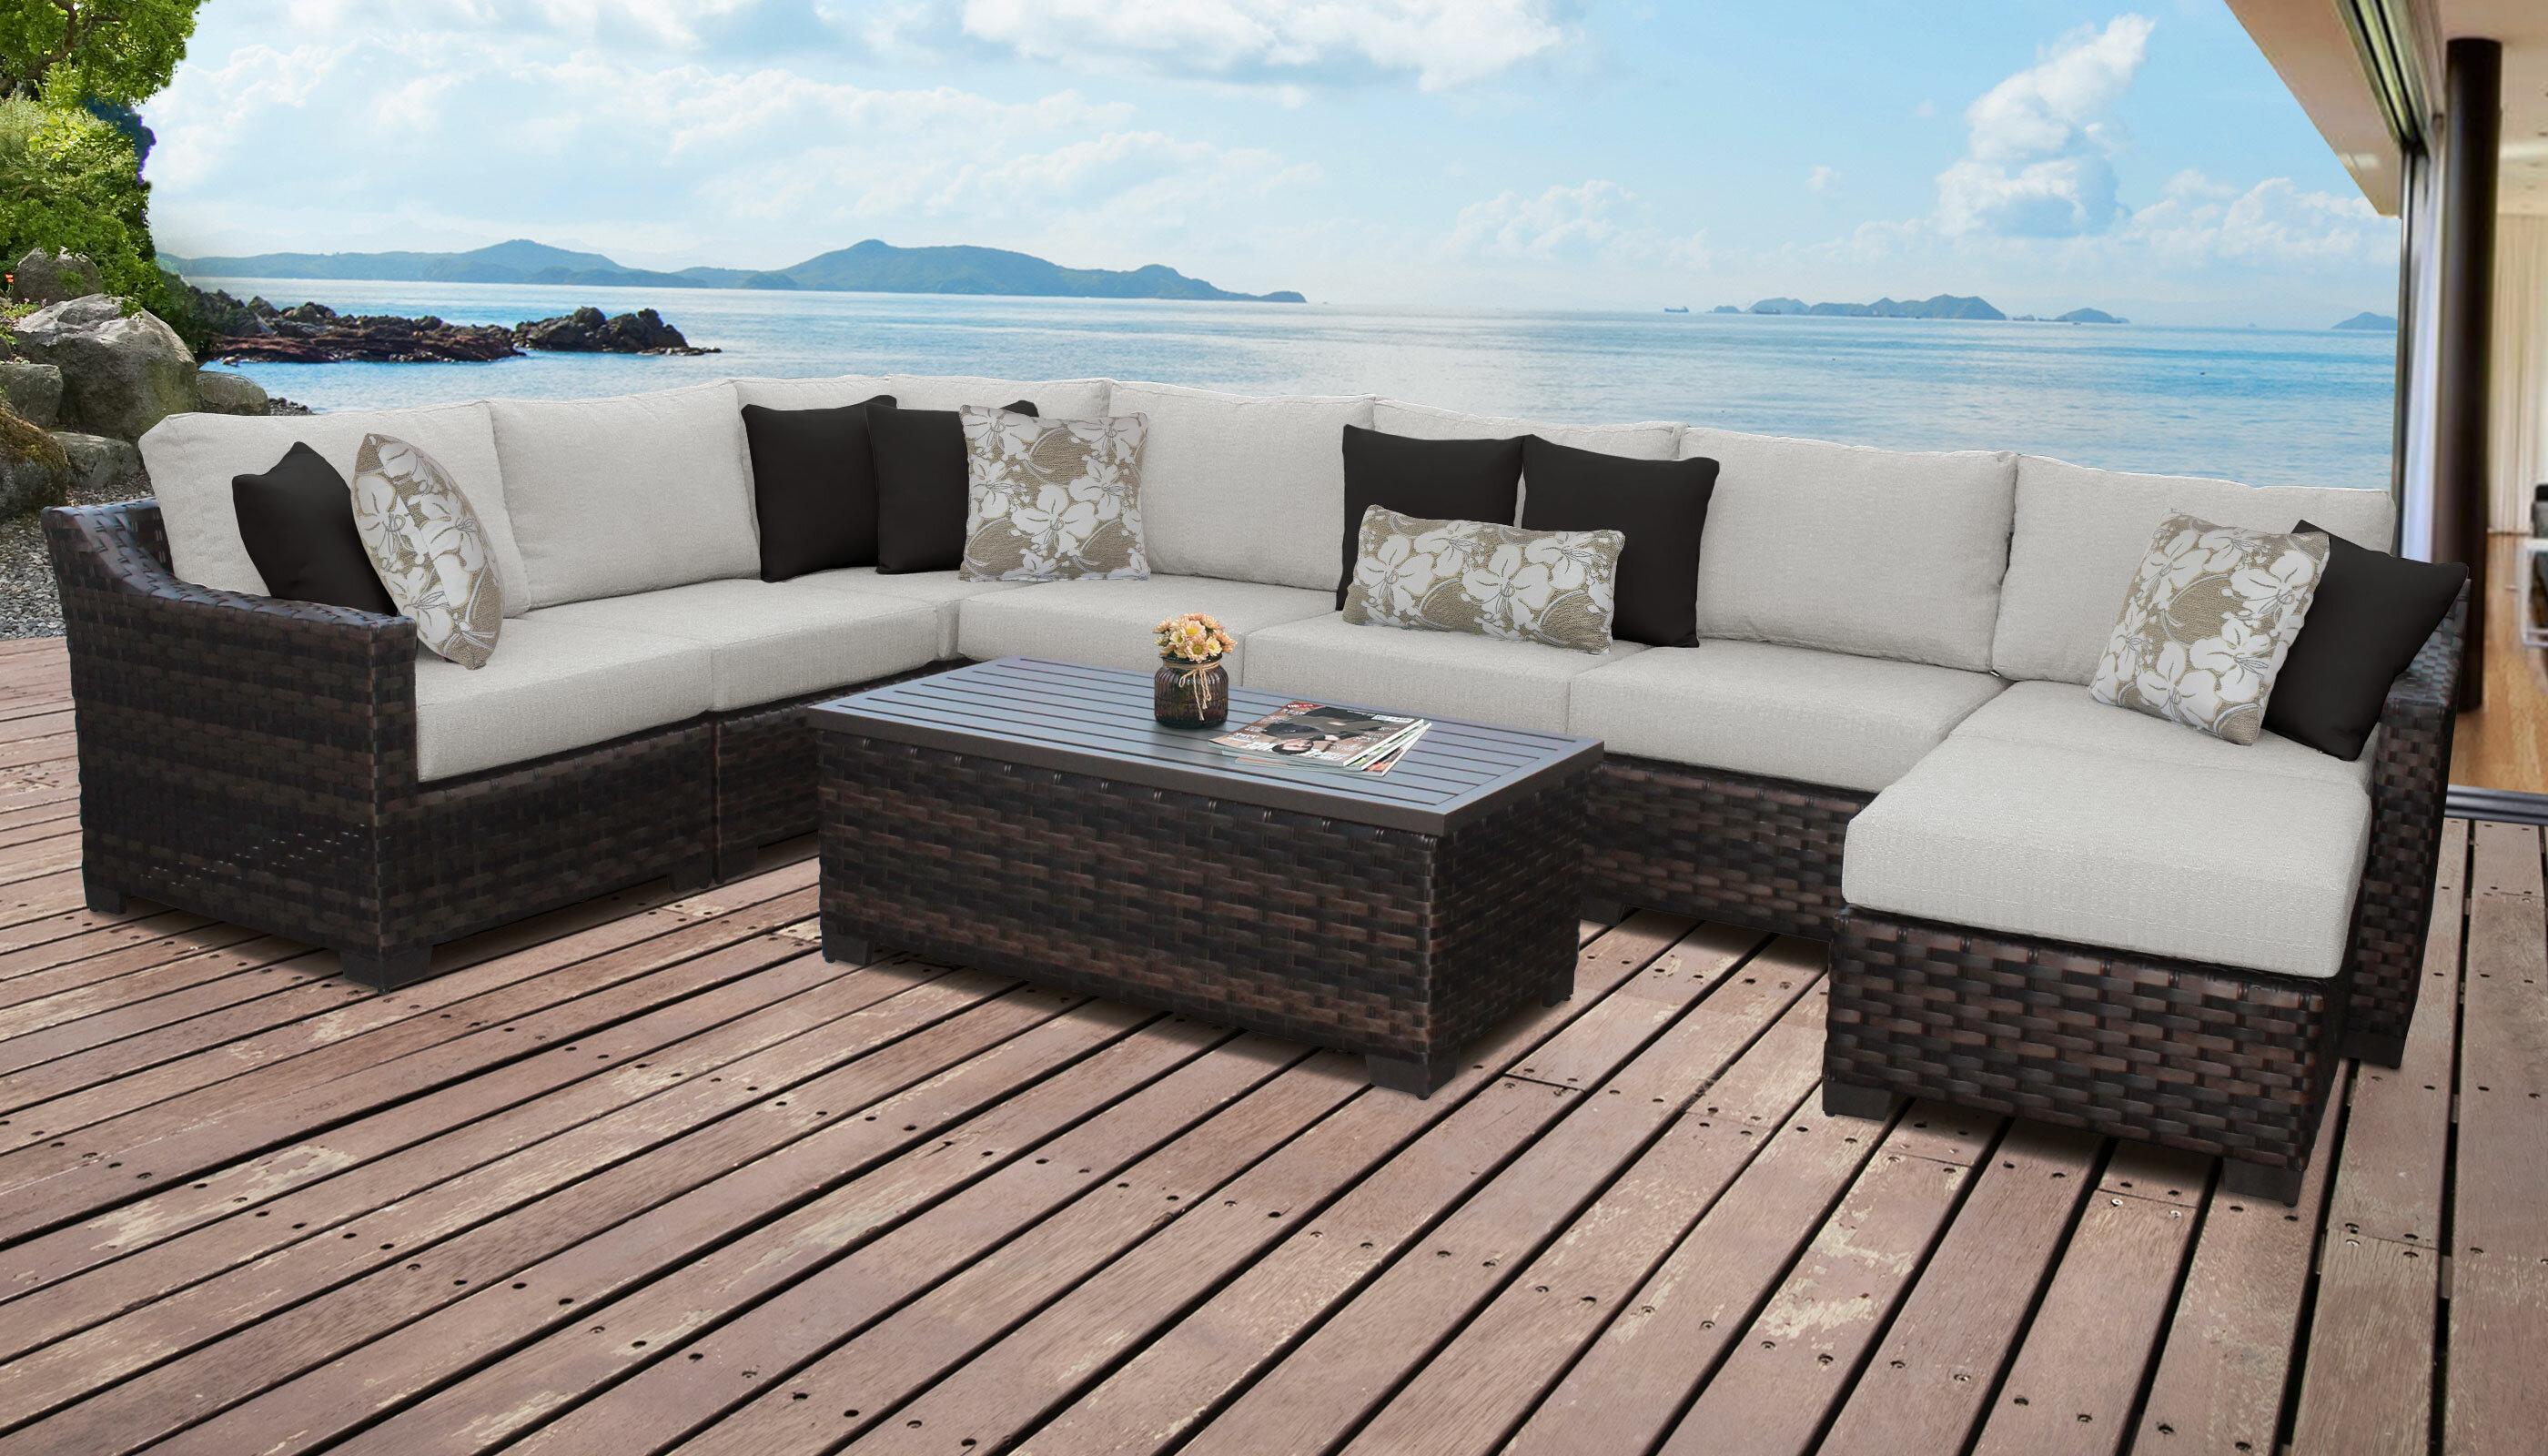 Kathy Ireland Homes Gardens By Tk Clics River Brook 9 Piece Outdoor Wicker Patio Furniture Set 09d Wayfair